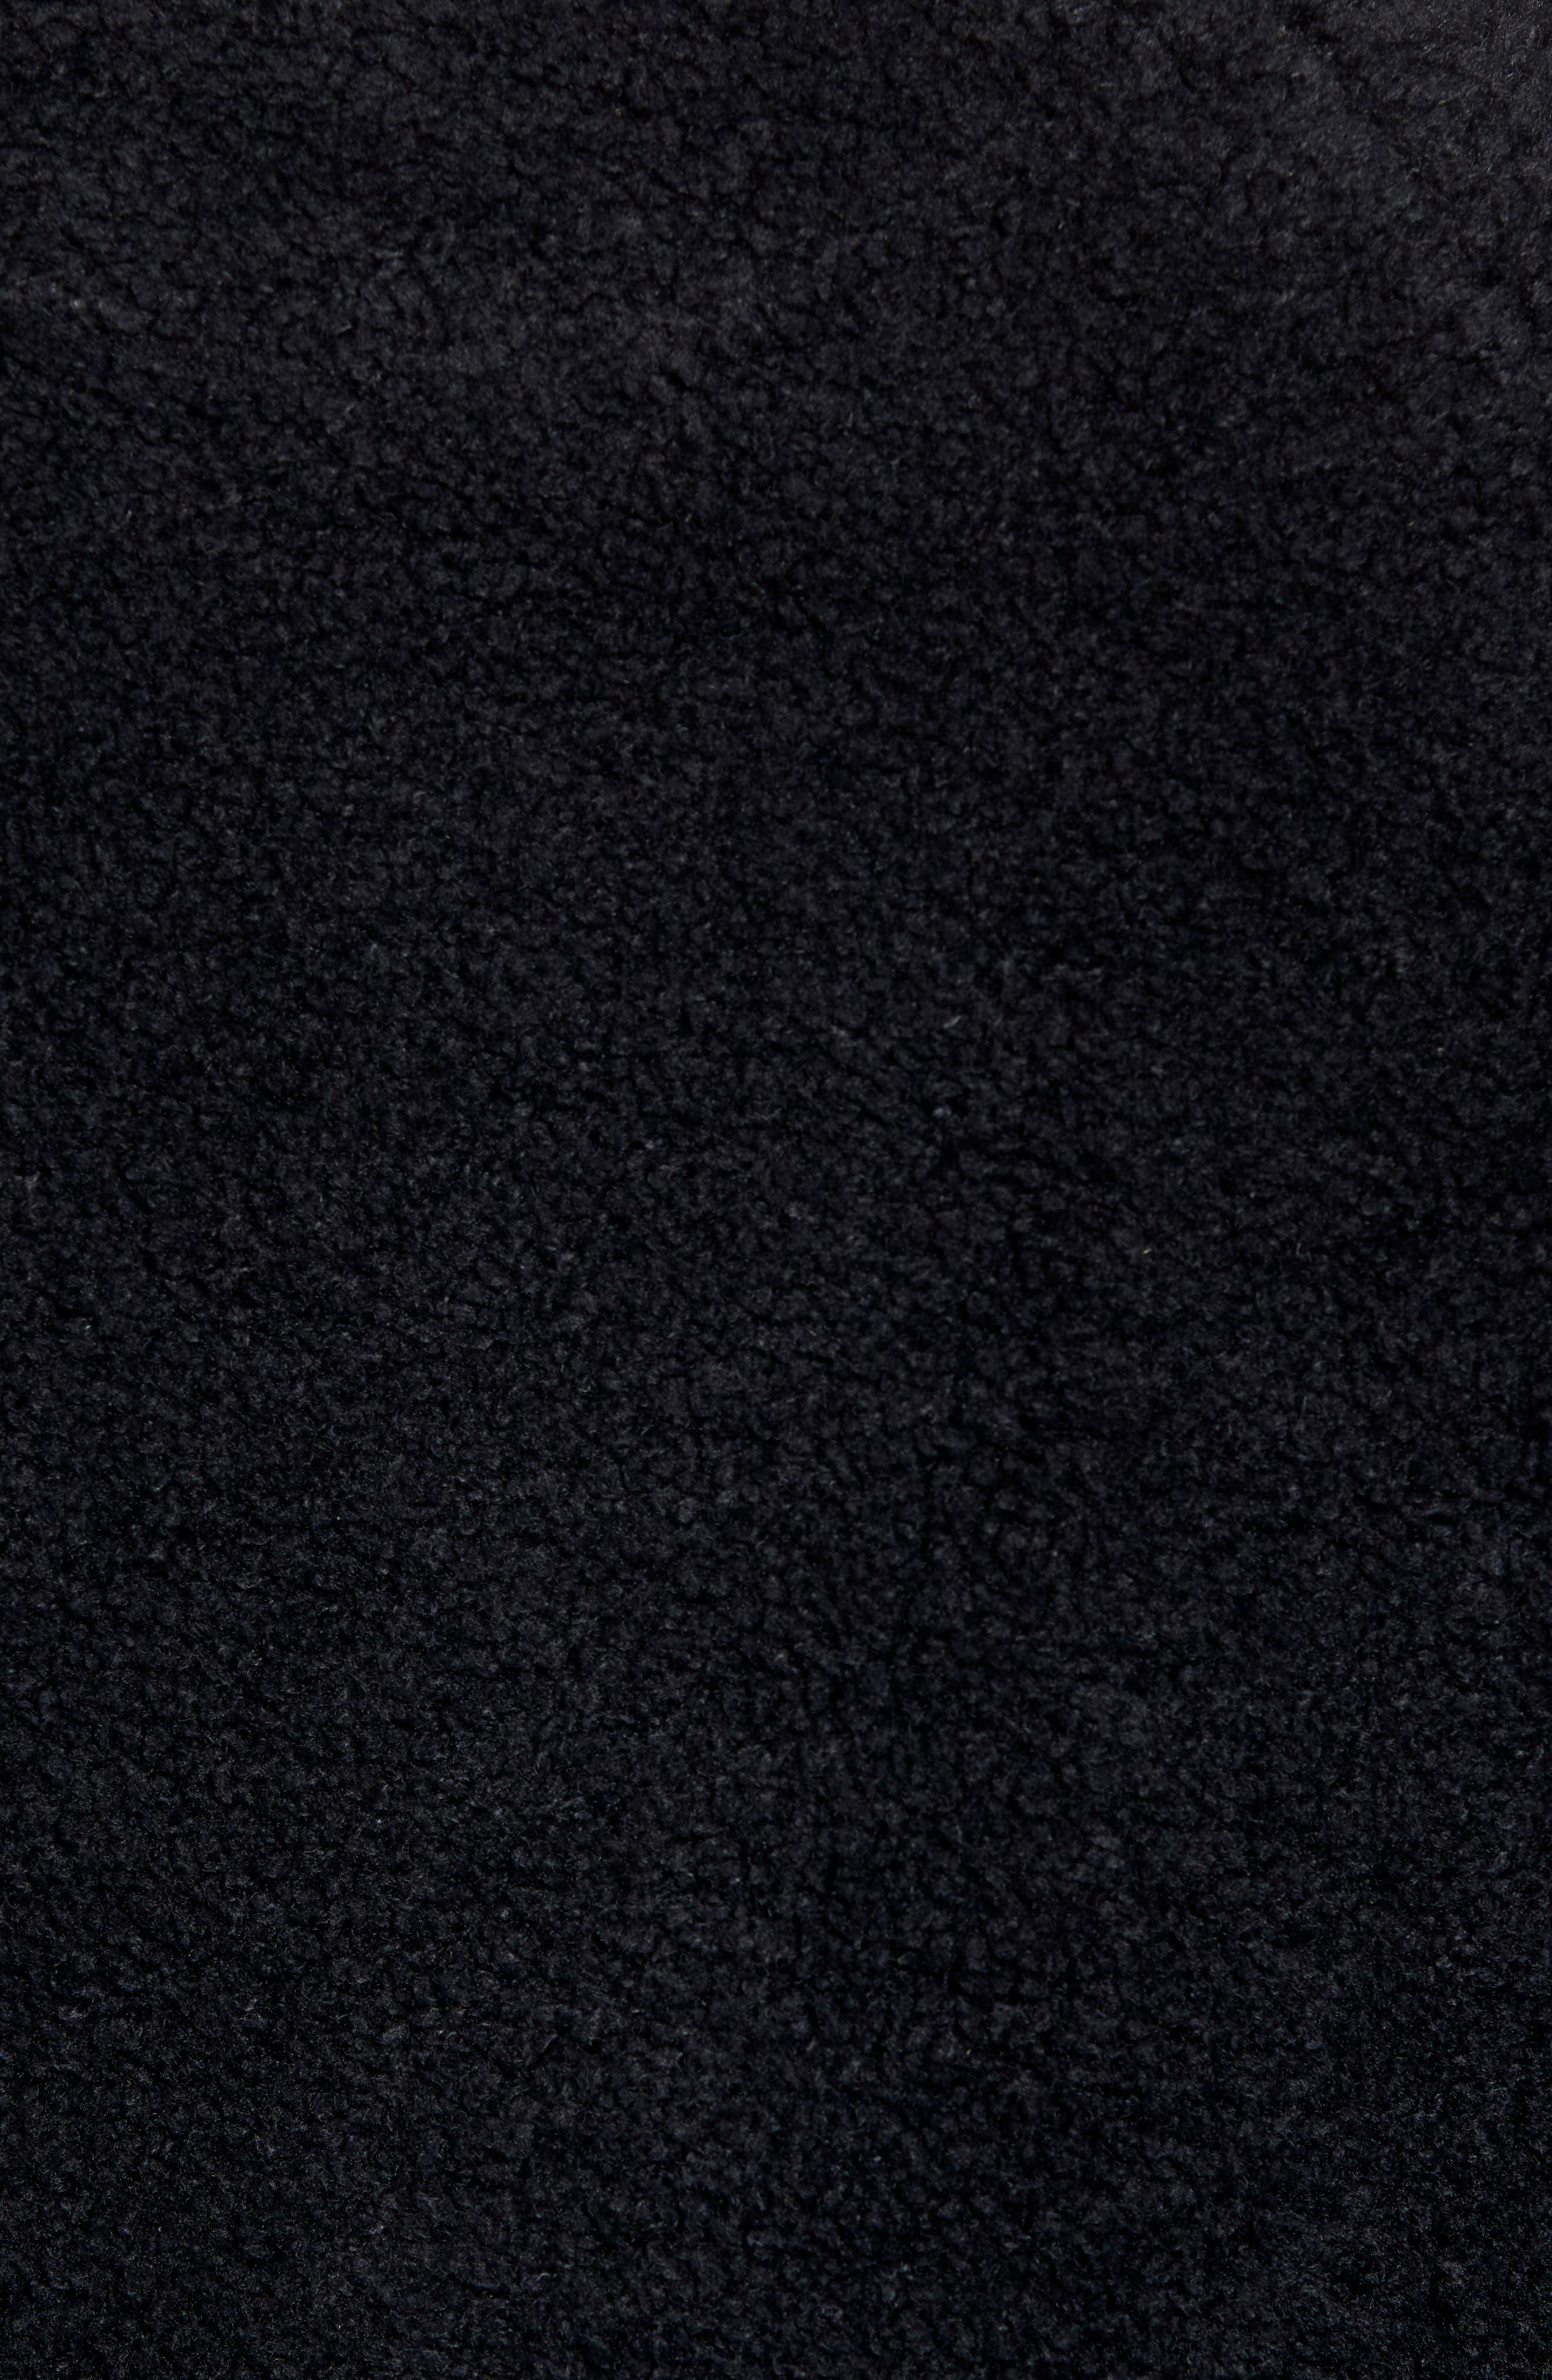 Deliverance Fleece Sweatshirt,                             Alternate thumbnail 5, color,